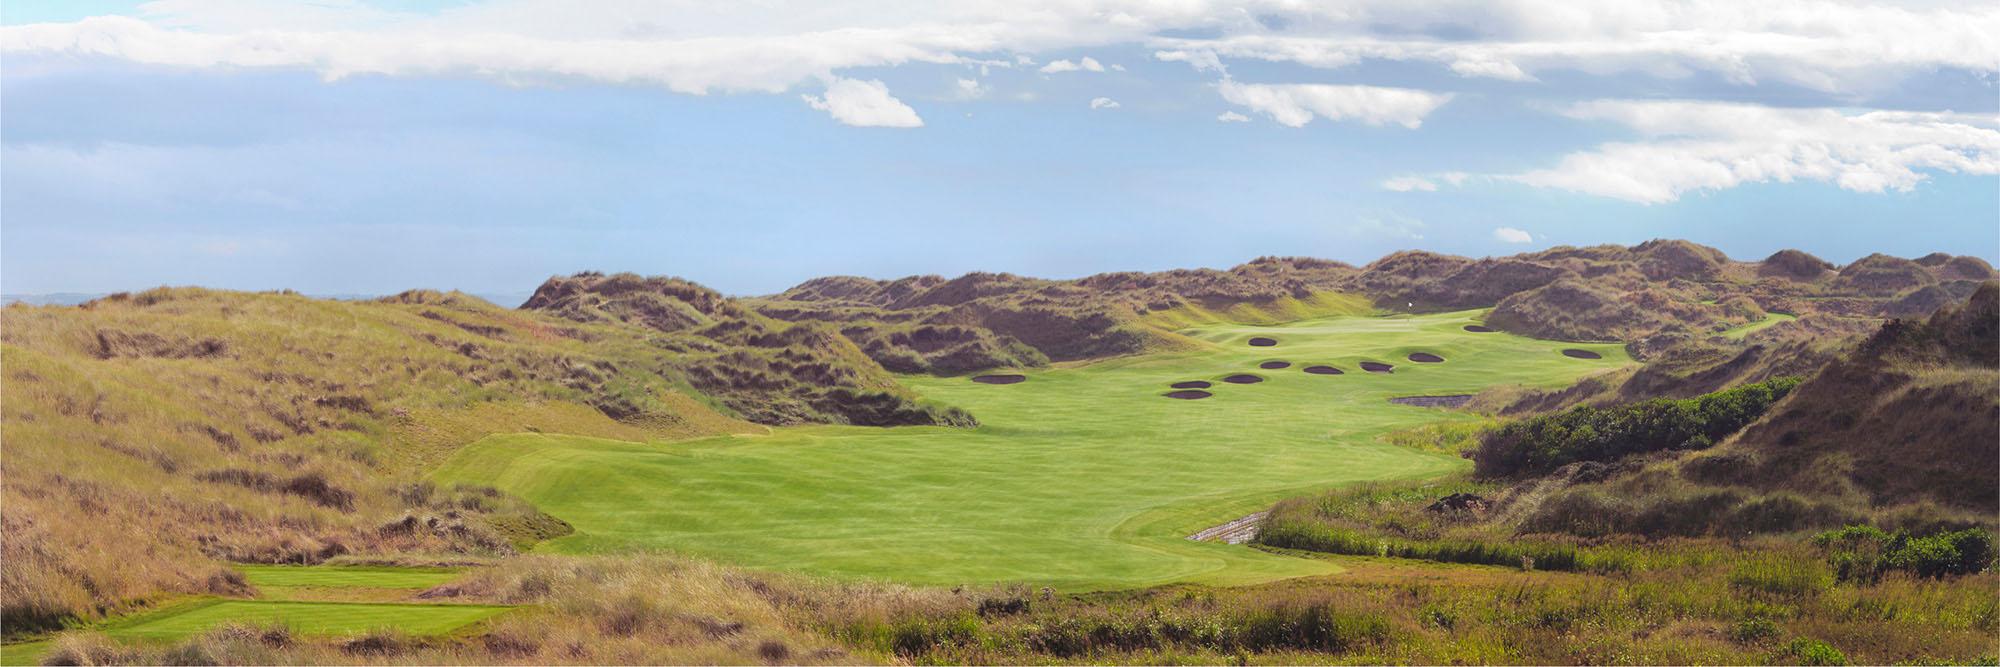 Golf Course Image - Trump International No. 4